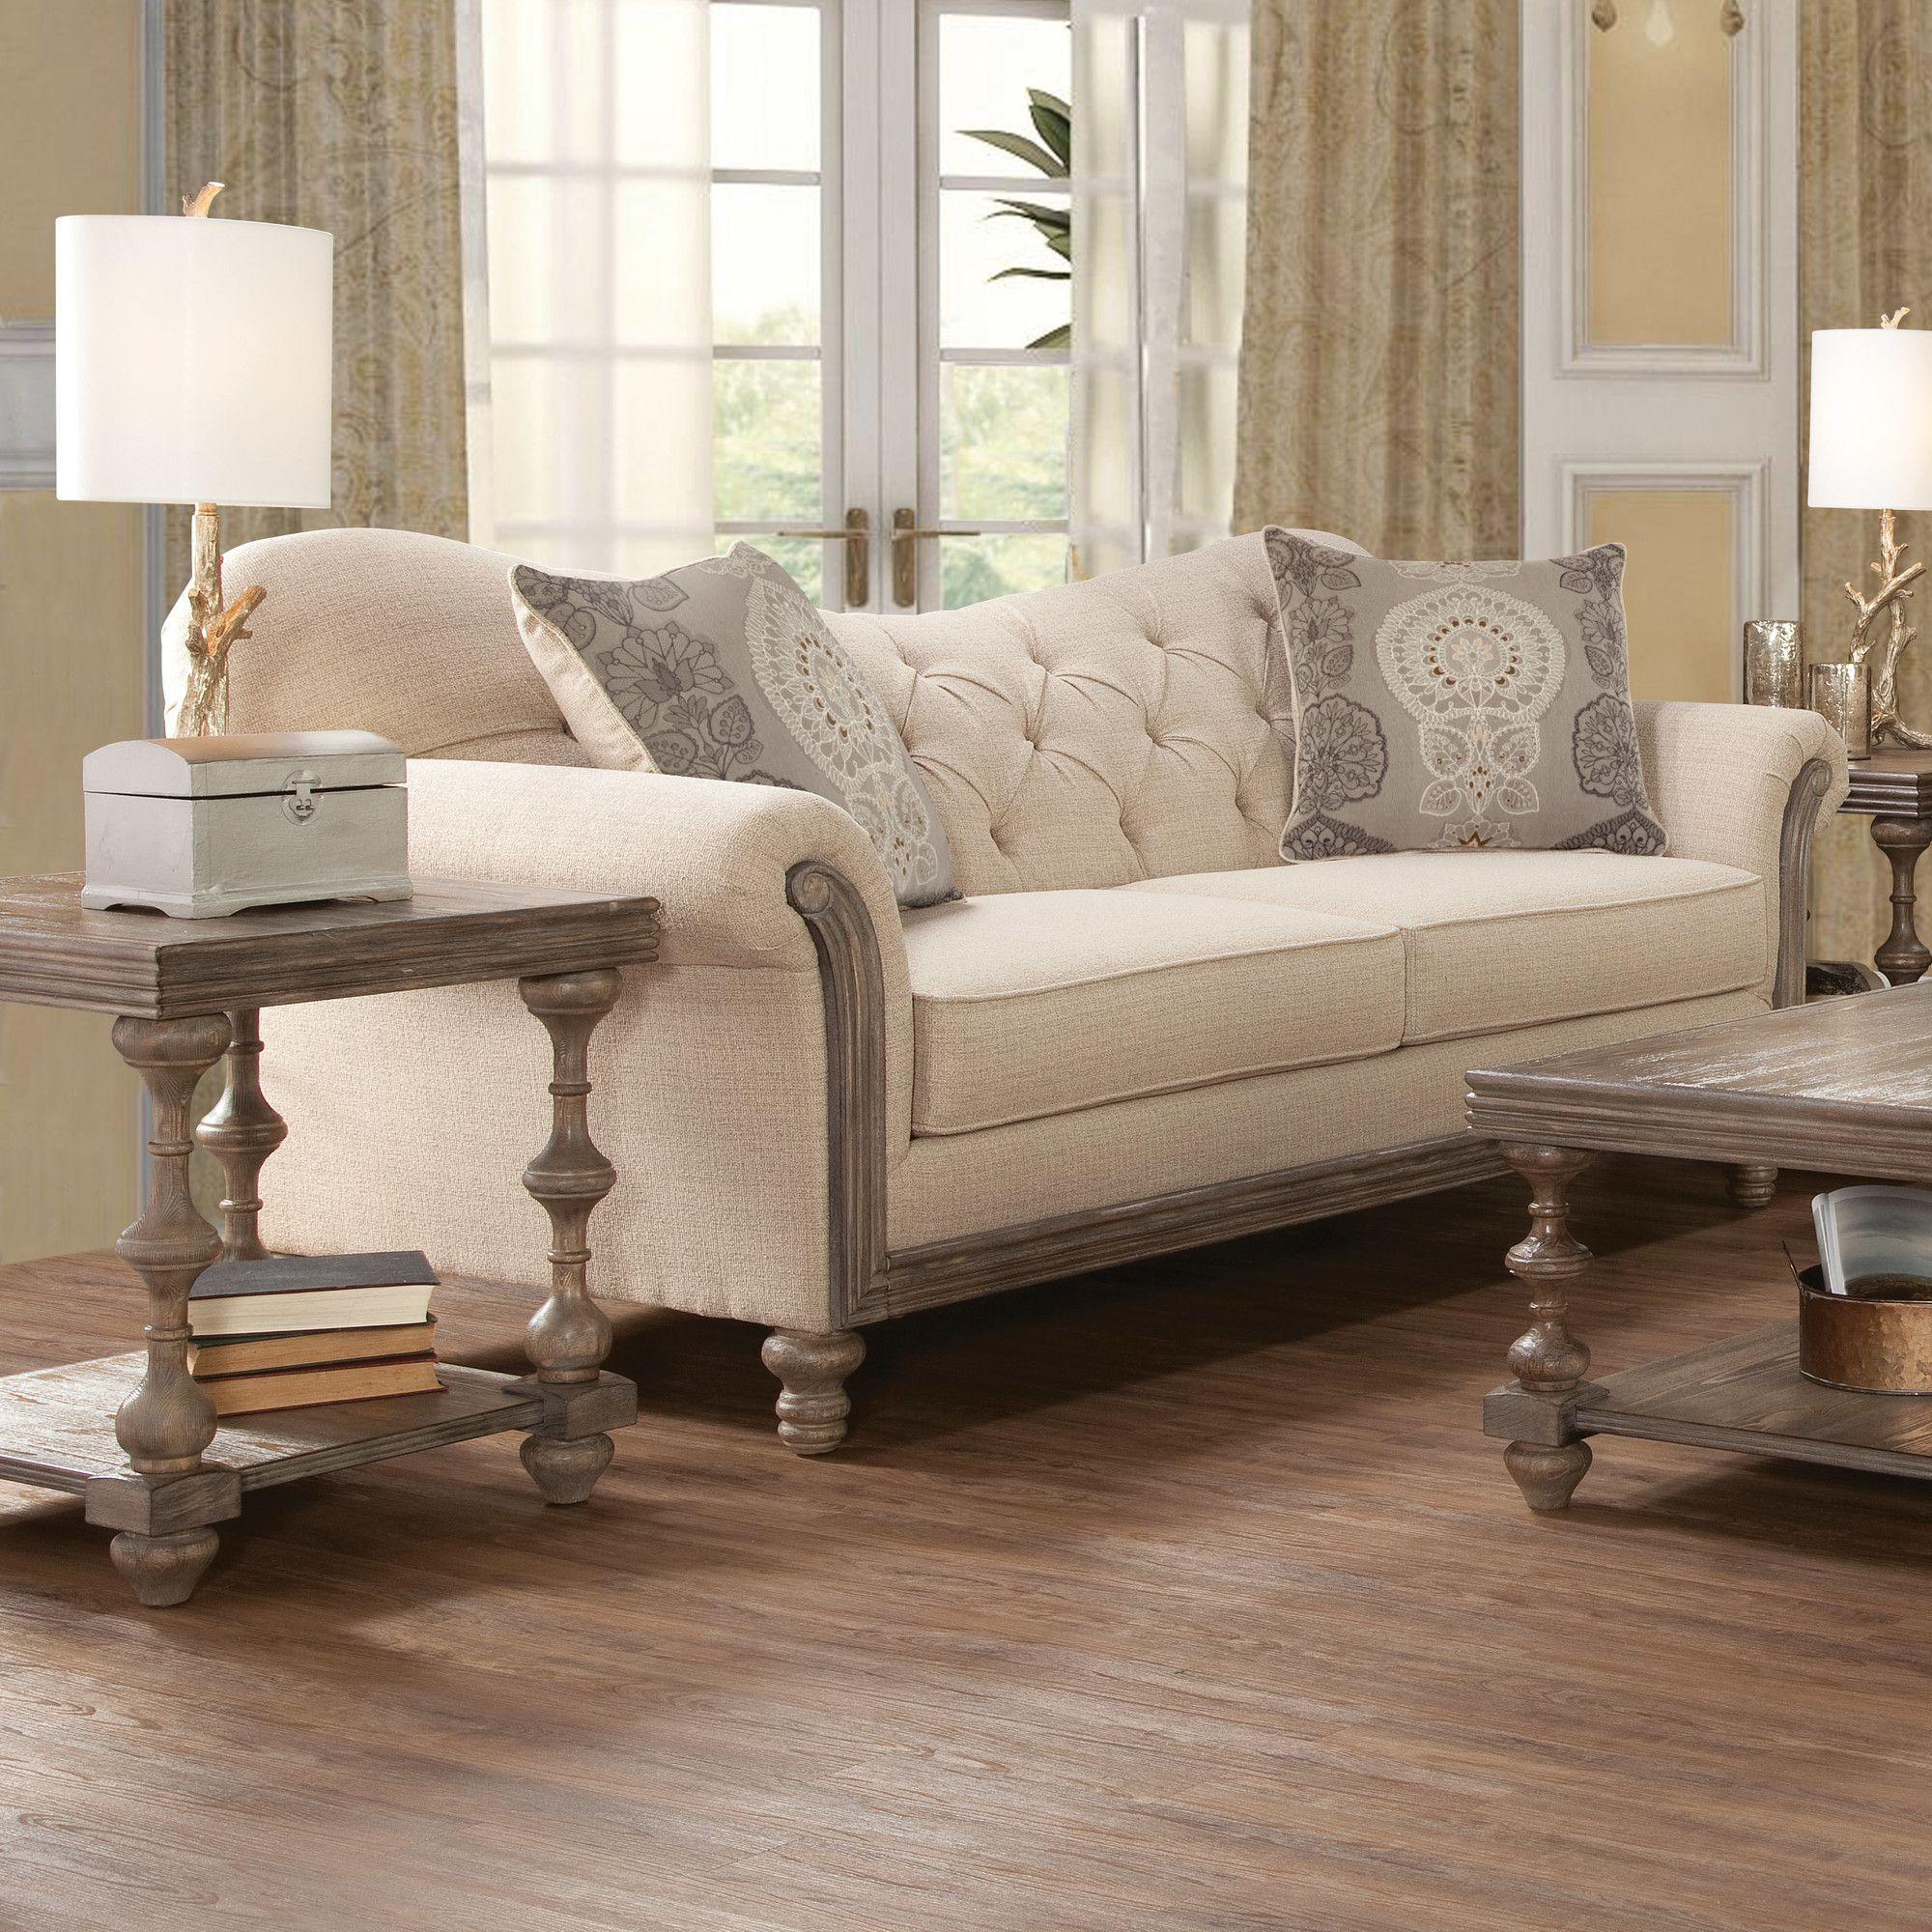 sofa couch home pdx furniture astoria at rta serta wayfair reviews